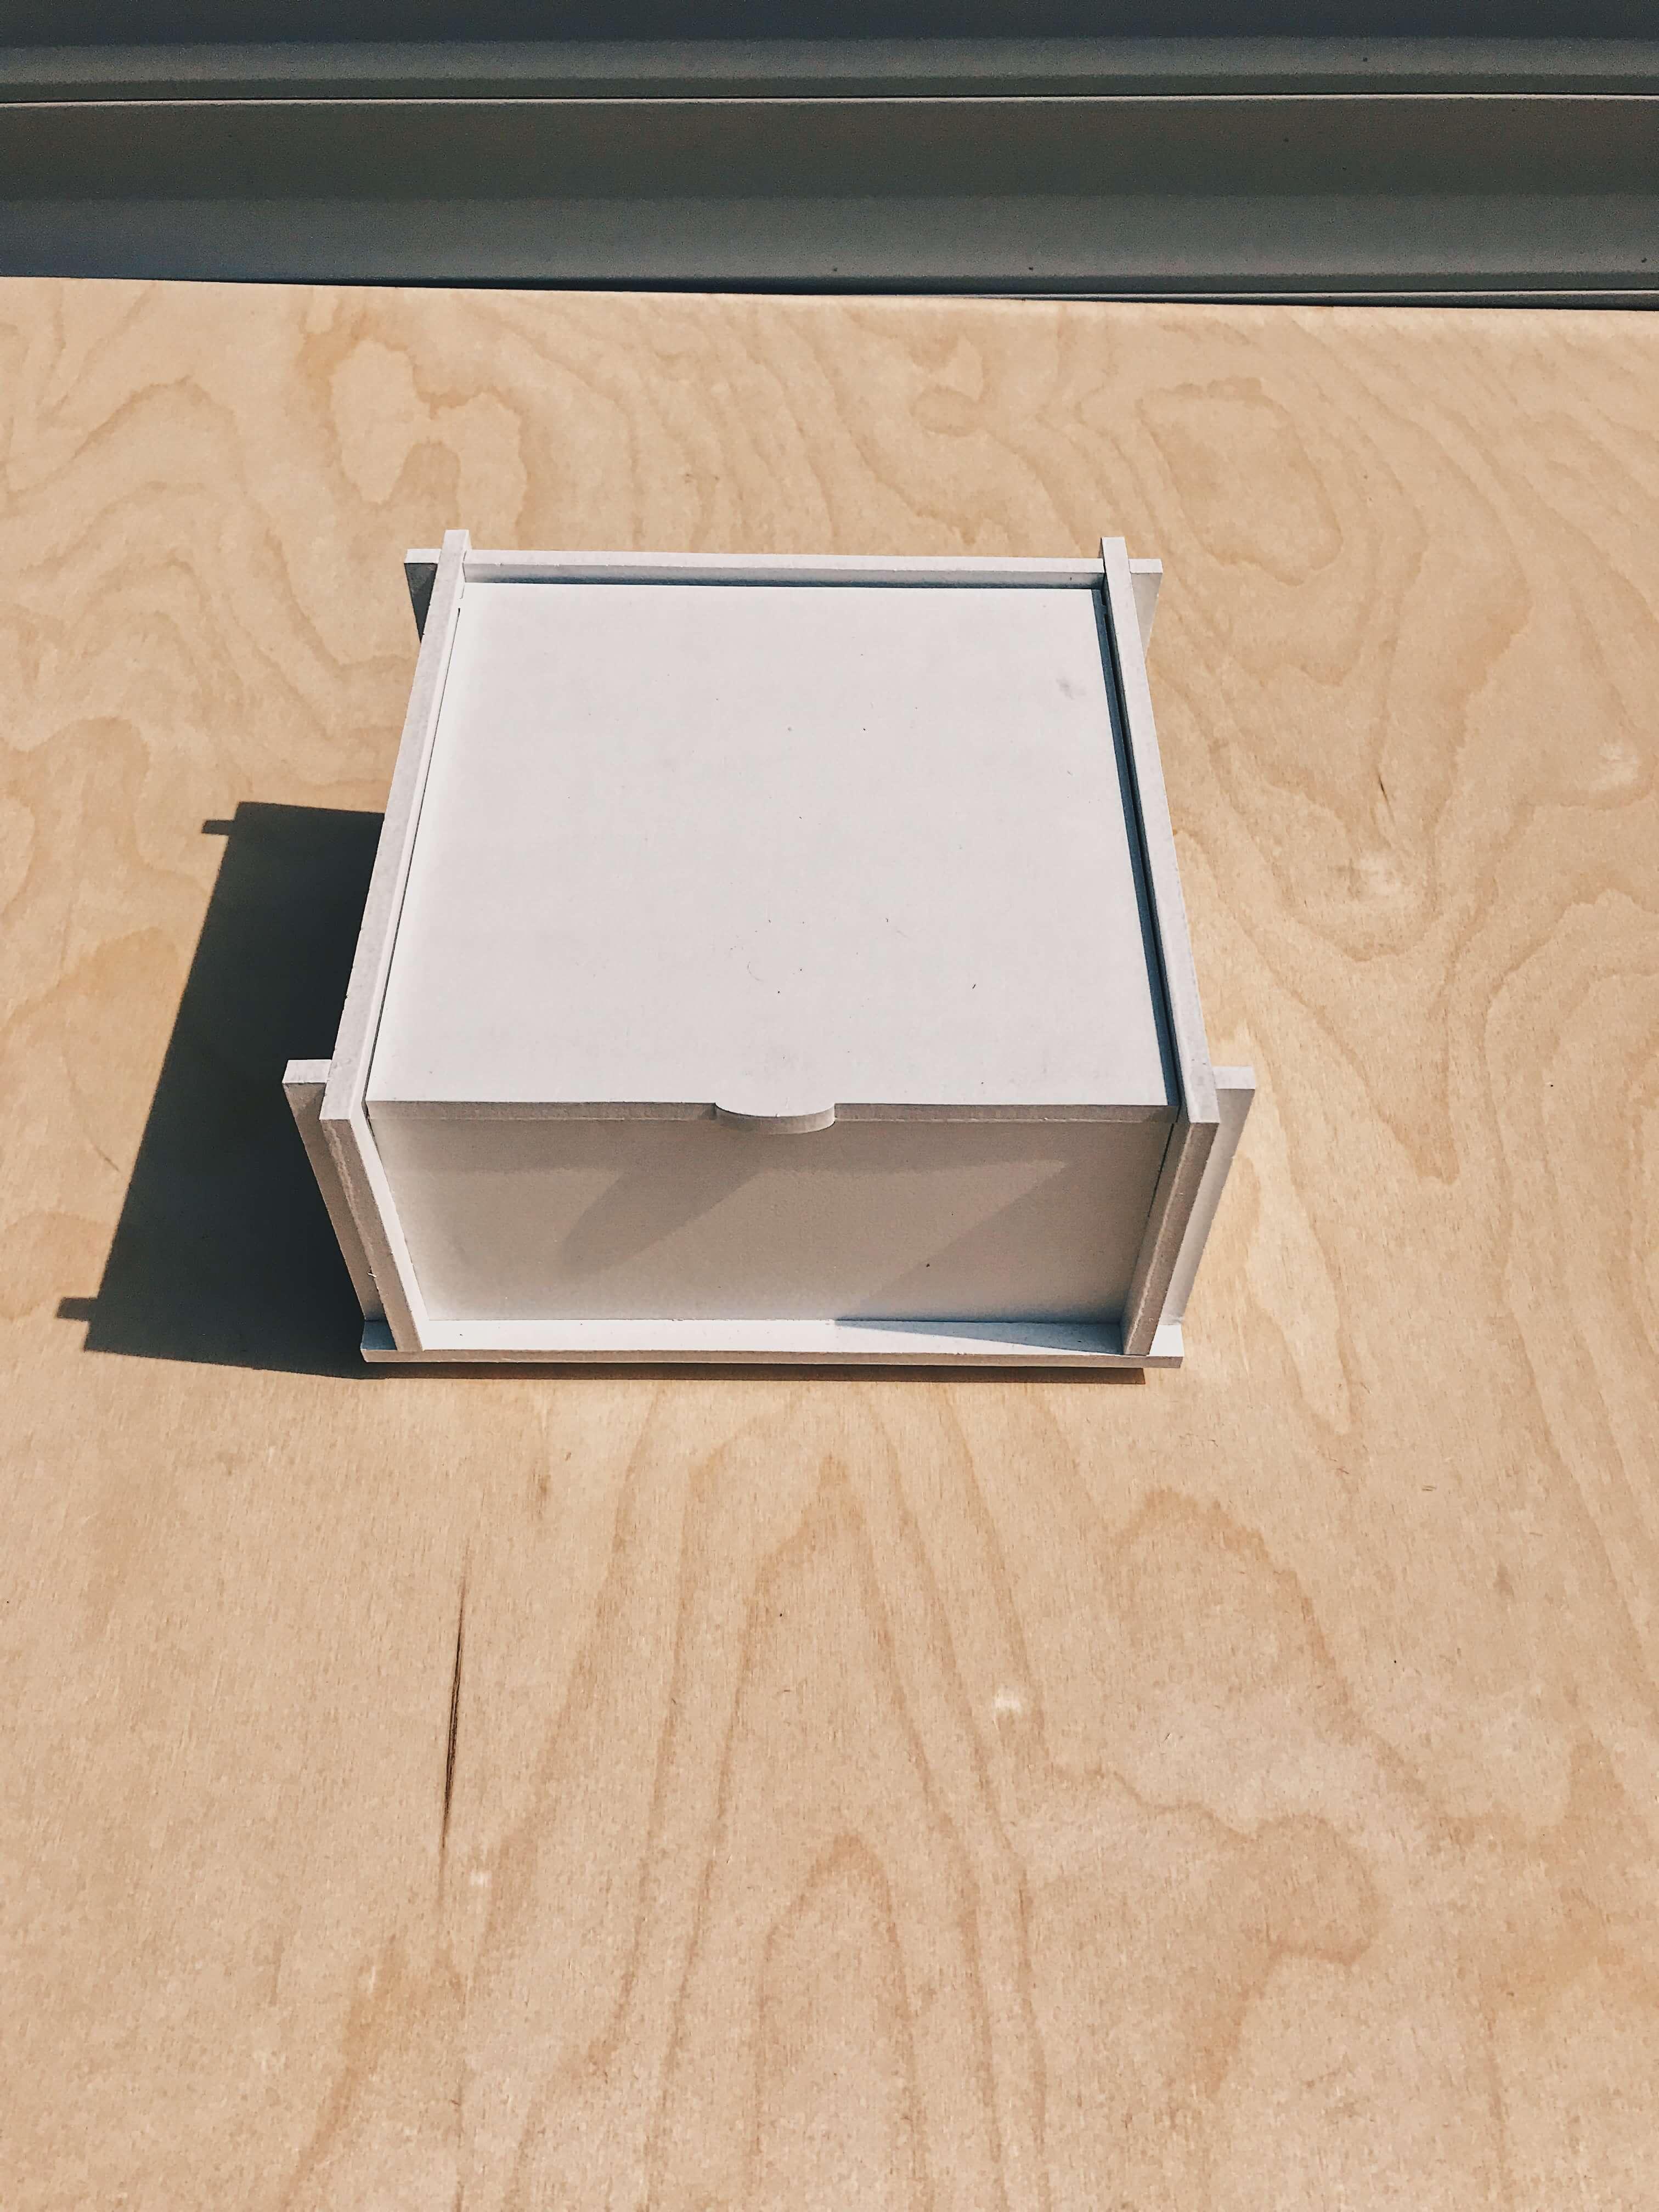 biencraft - лазерная резка и гравировка 1